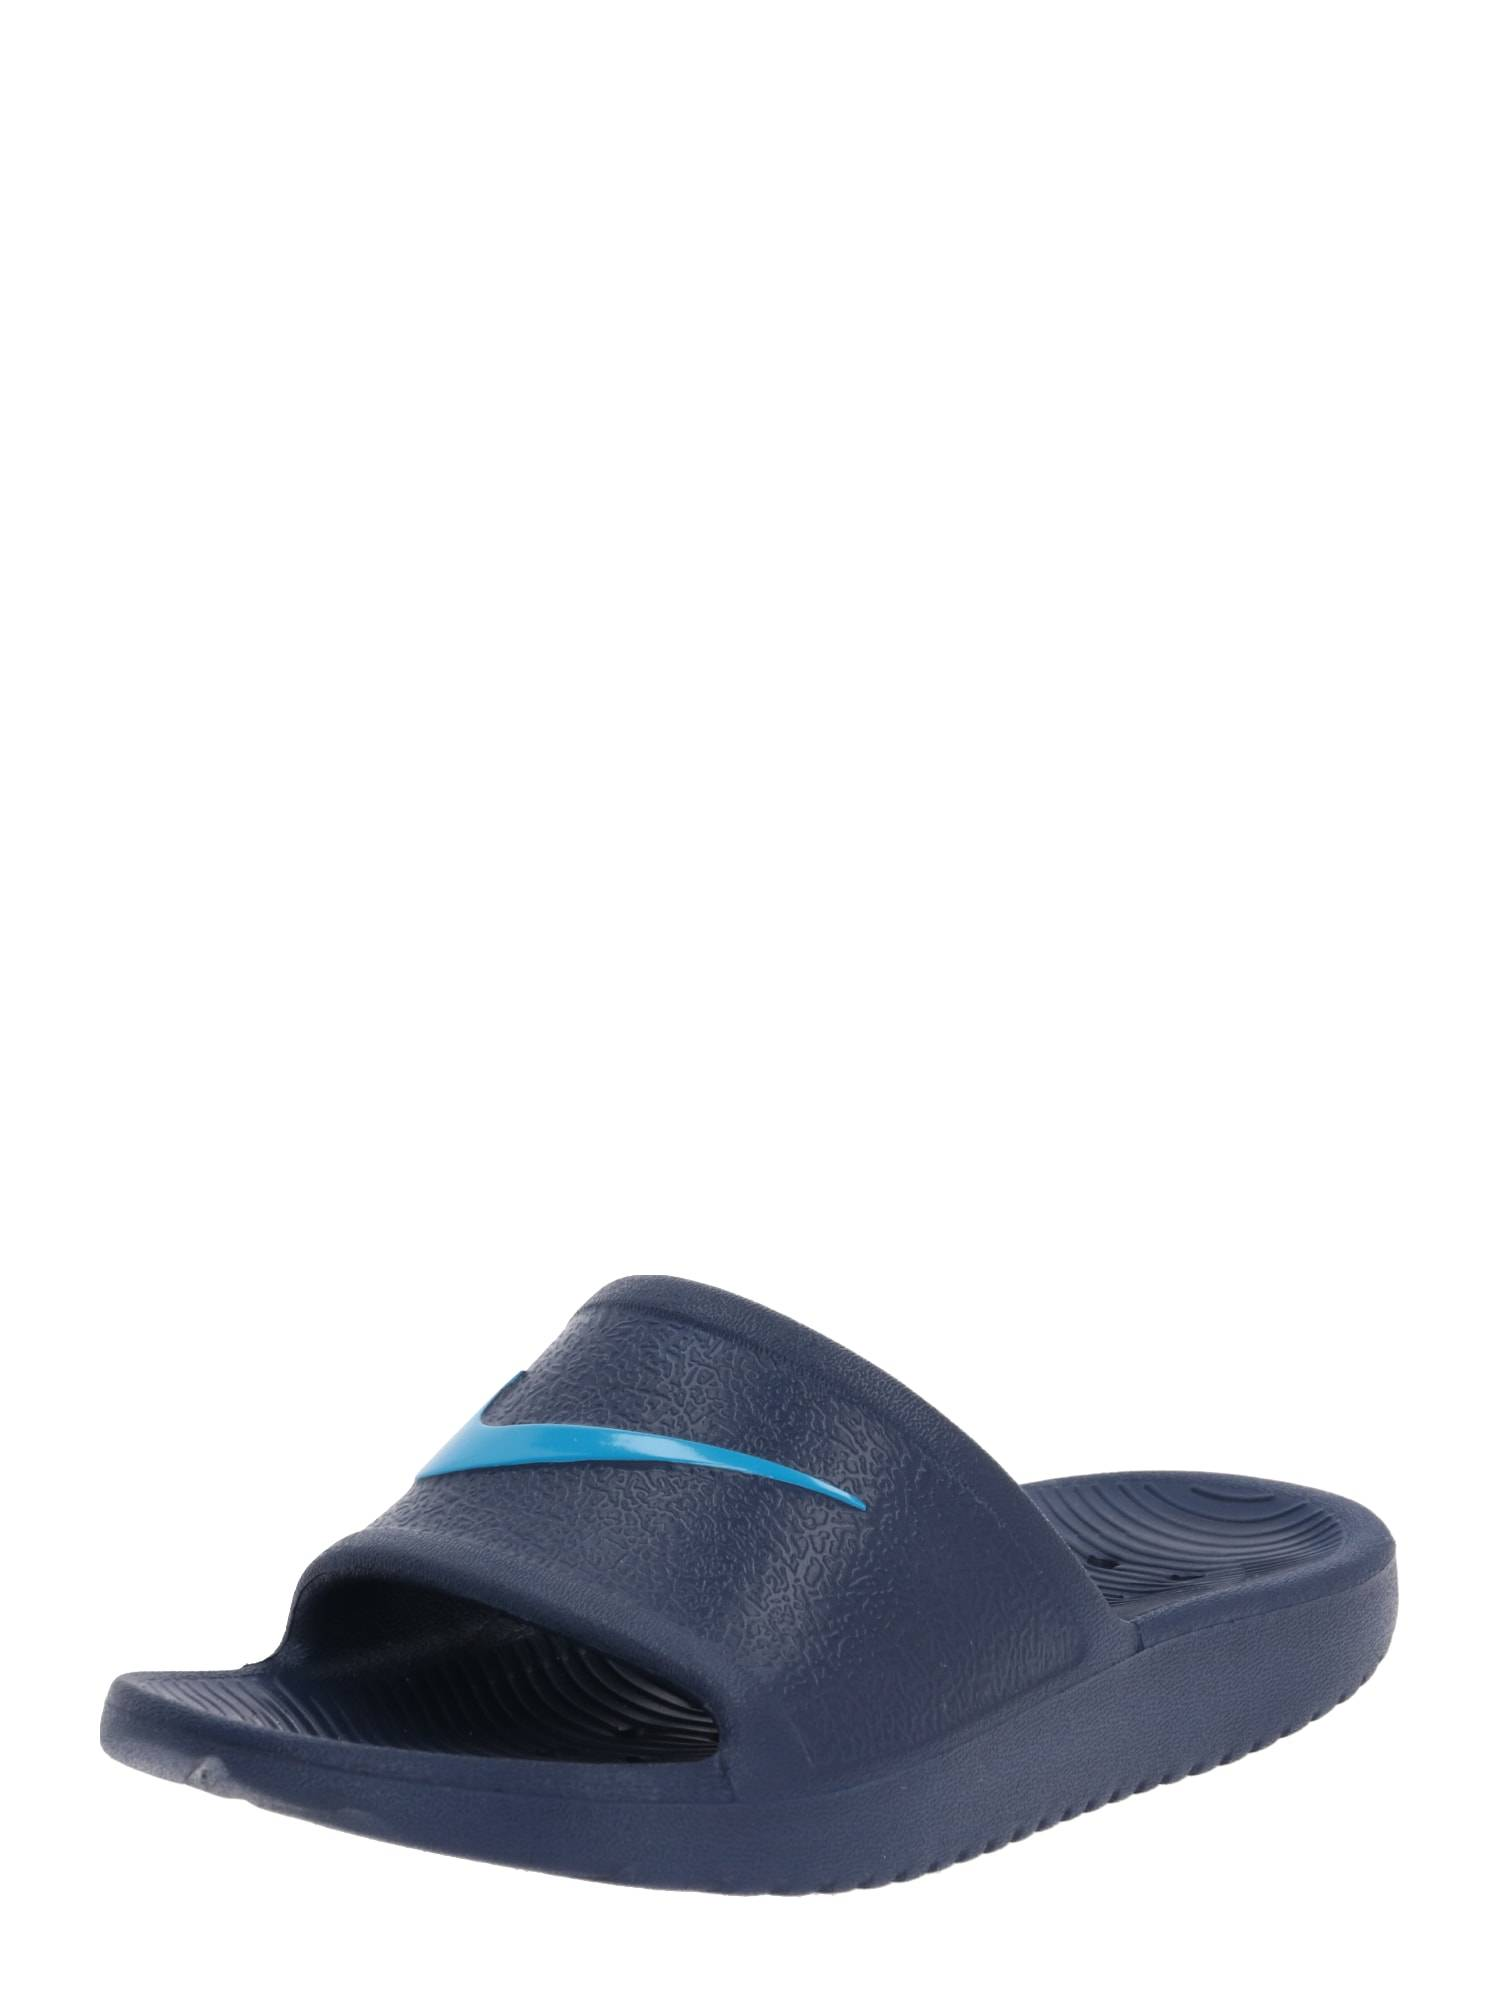 Nike Sportswear Claquettes / Tongs 'KAWA'  - Bleu - Taille: 12C - boy